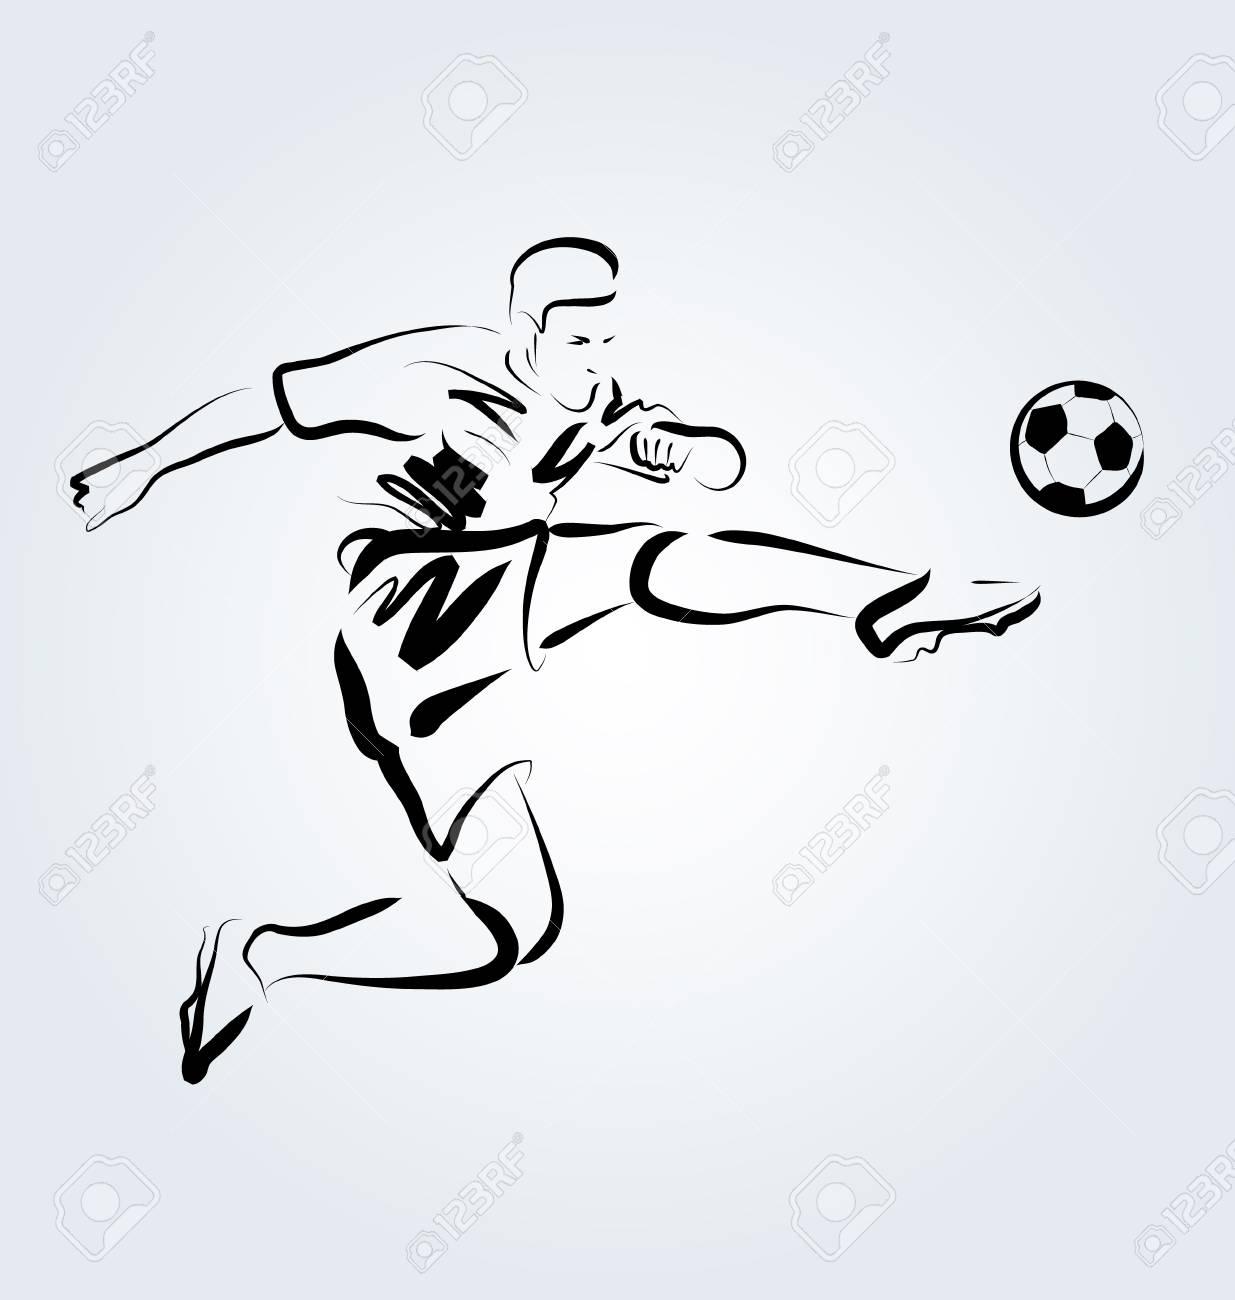 Vector Line Sketch Footballer Royalty Free Cliparts, Vectors, And